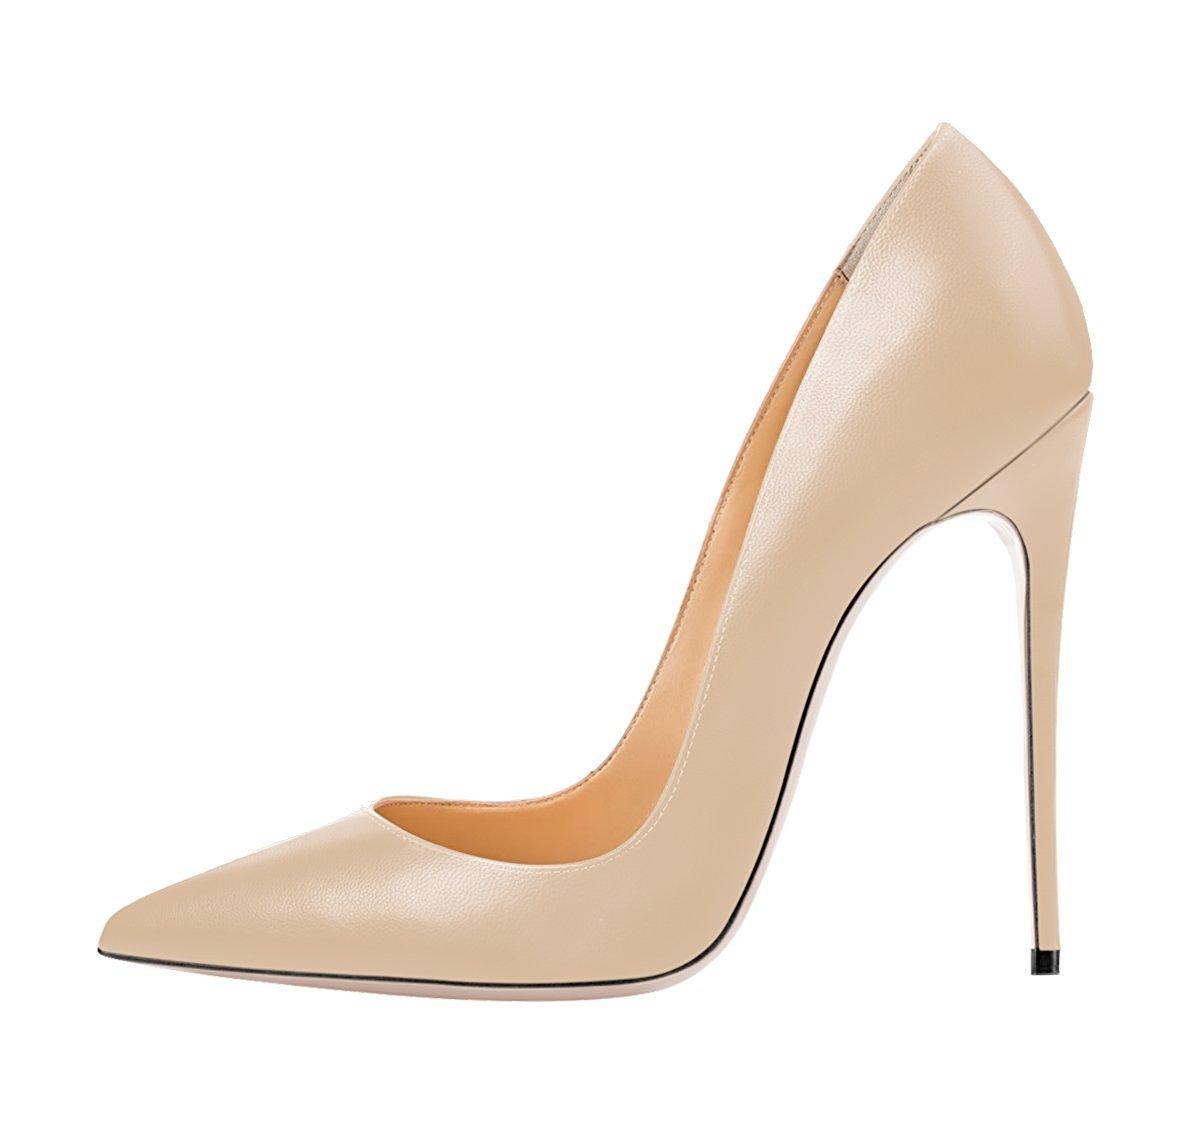 b5ac2f30992c6b Jushee Damen Sexy Klassische Schwarz Stiletto High Heels Kleid Buuml ro  Pumps45 EU